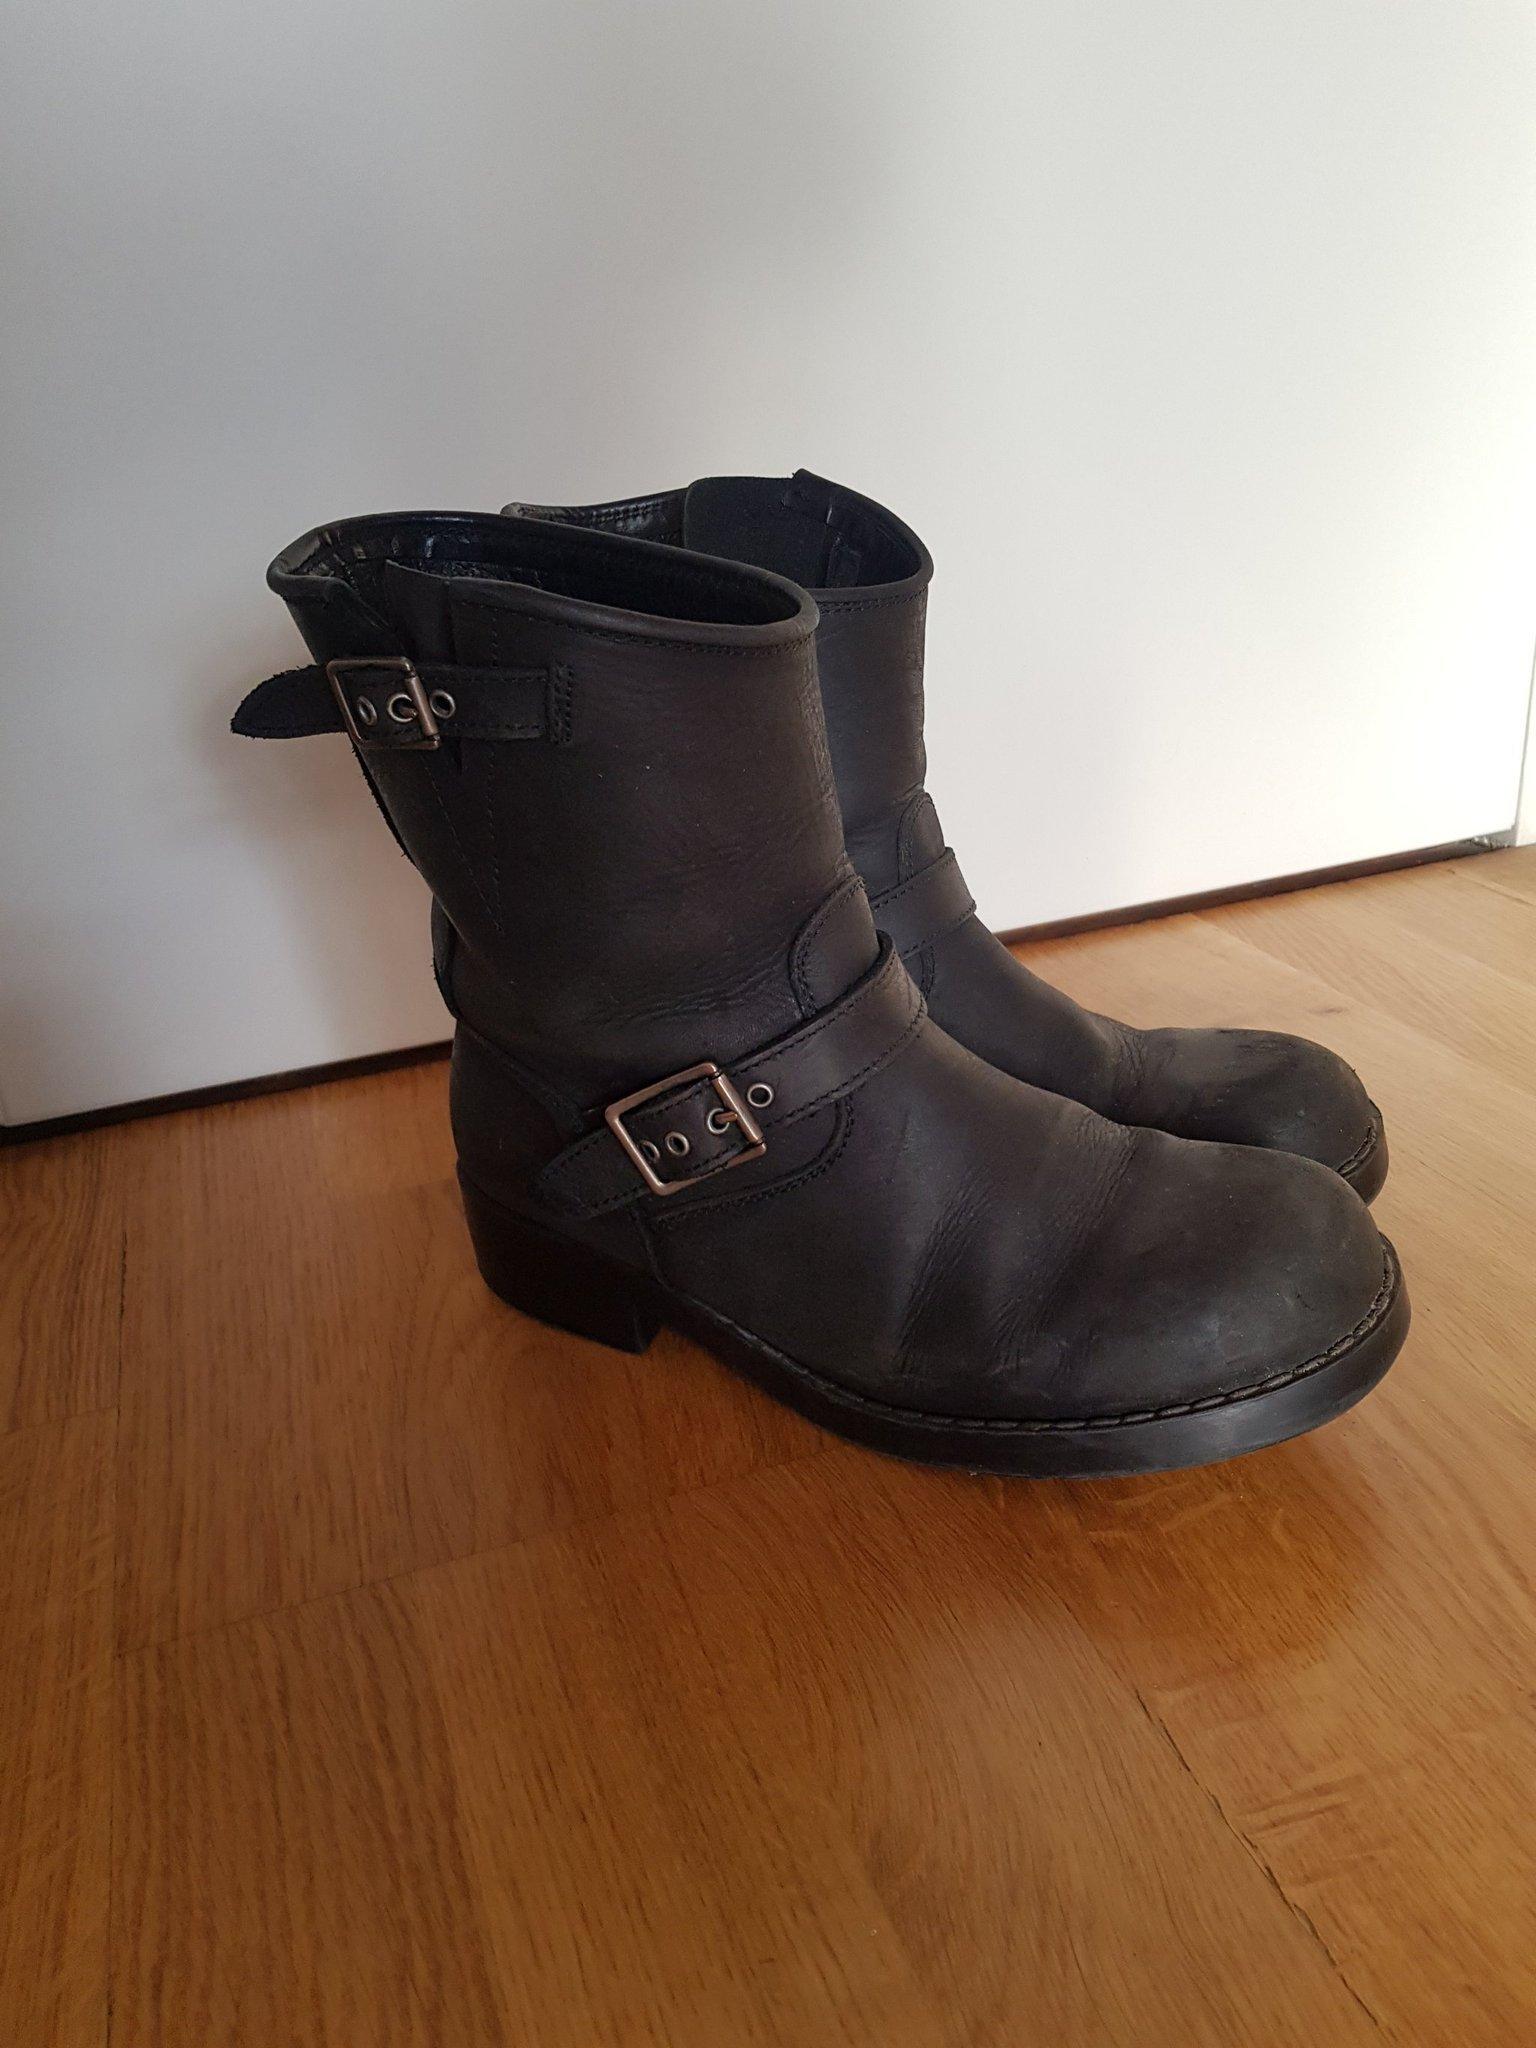 Johnny Bulls Boots storlek 41